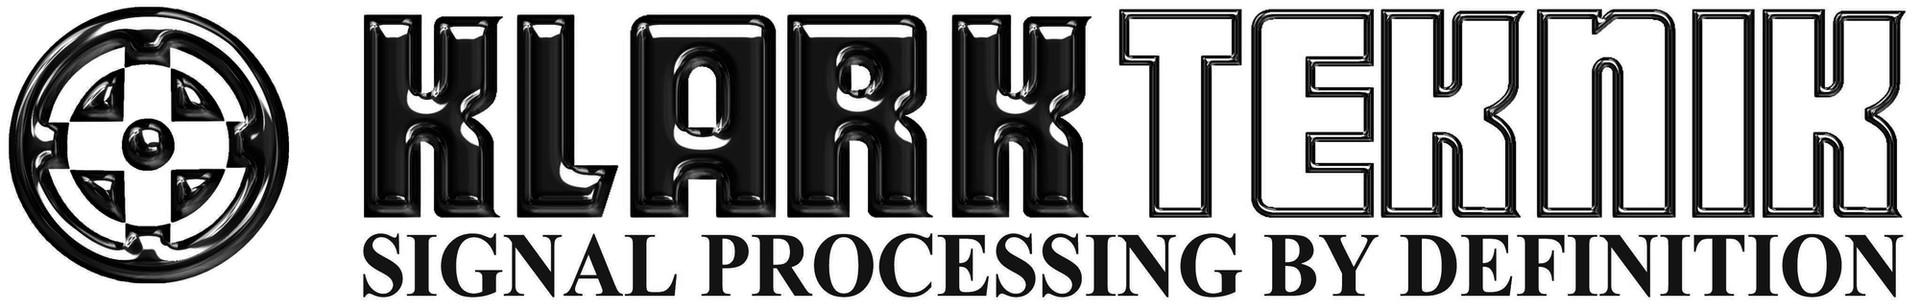 Klark-Teknik-Logo-BW 4.jpg